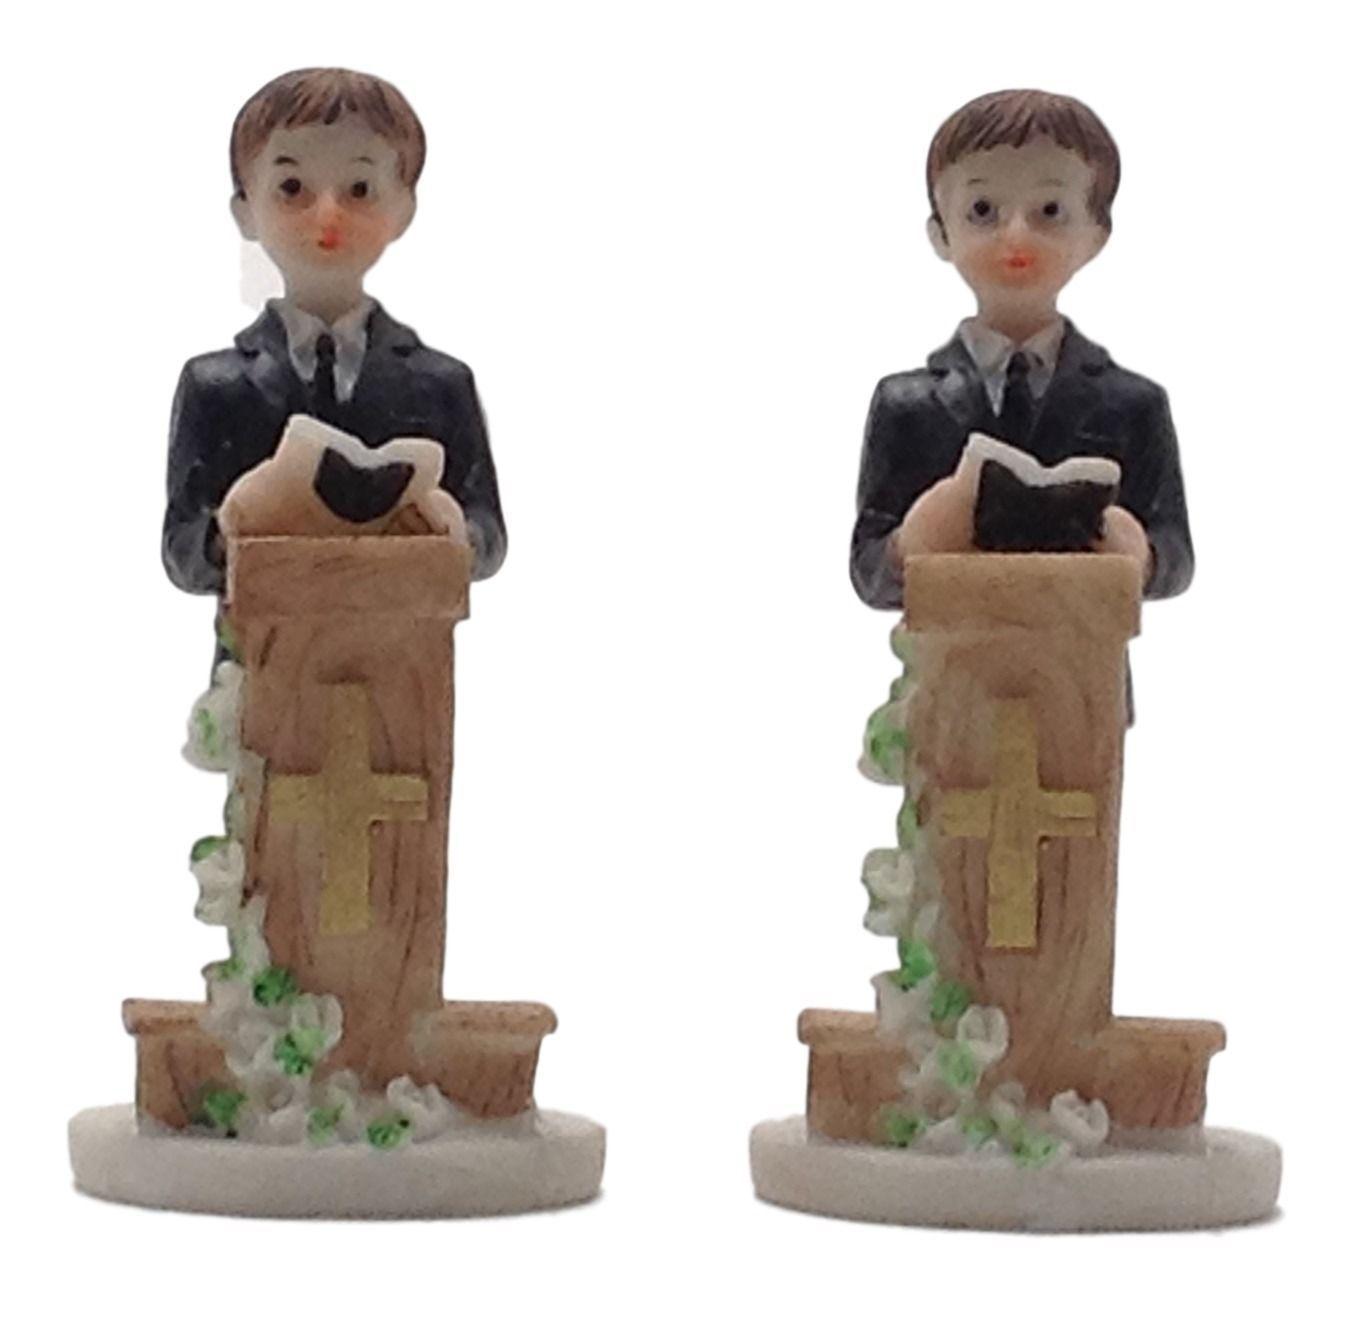 "2 pieces praying boy at podium 4"" tall communion favor decoration"